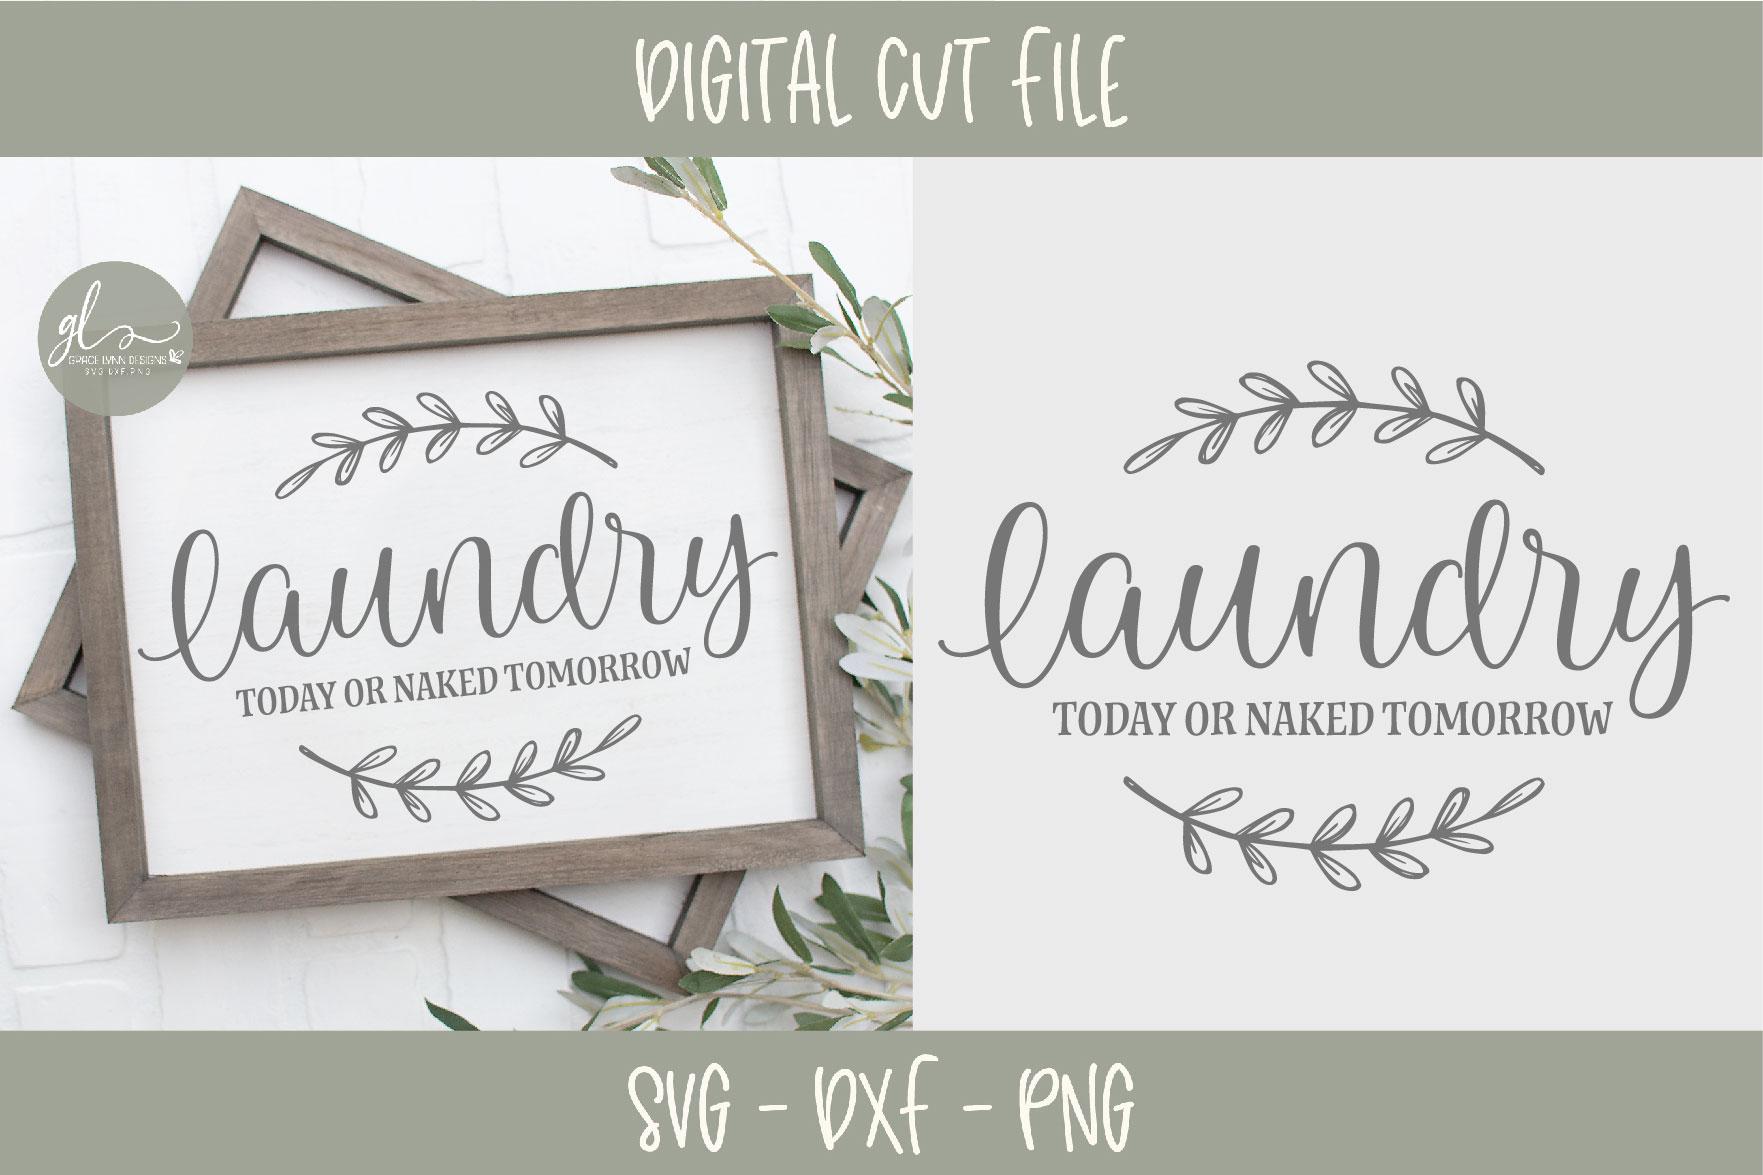 Laundry Sign Bundle - 20 Designs - SVG Cut Files example image 7